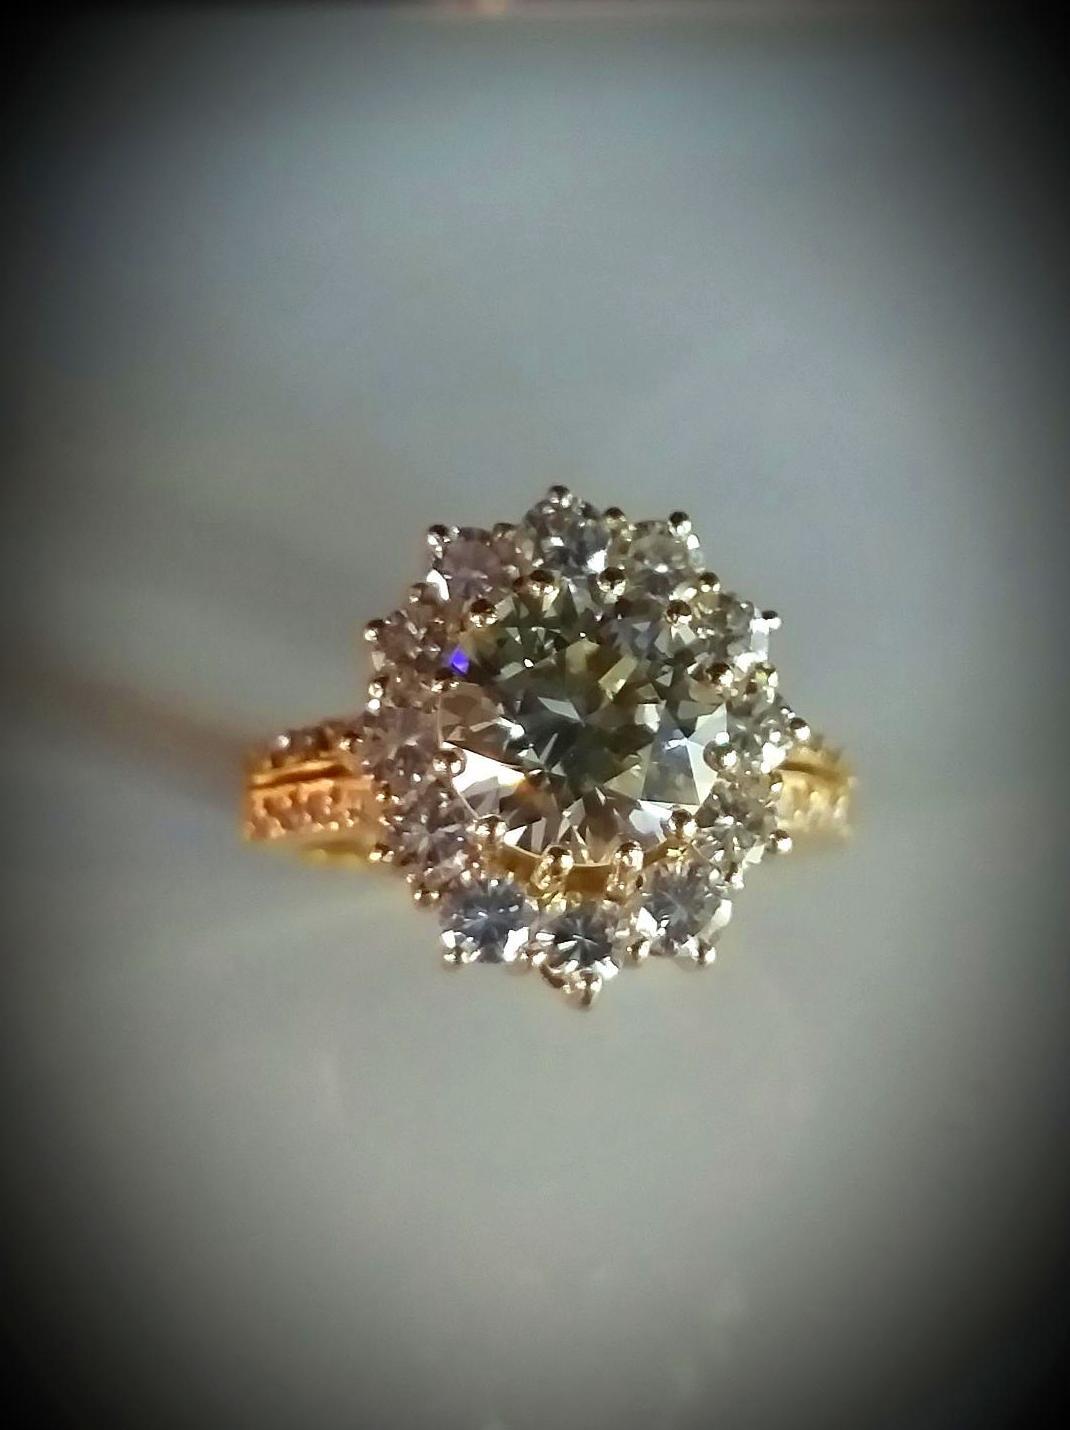 anillo de diamante central talla brillante 2.16 quilates con roseta de 12 brillantes de 0,12 quilates cada una